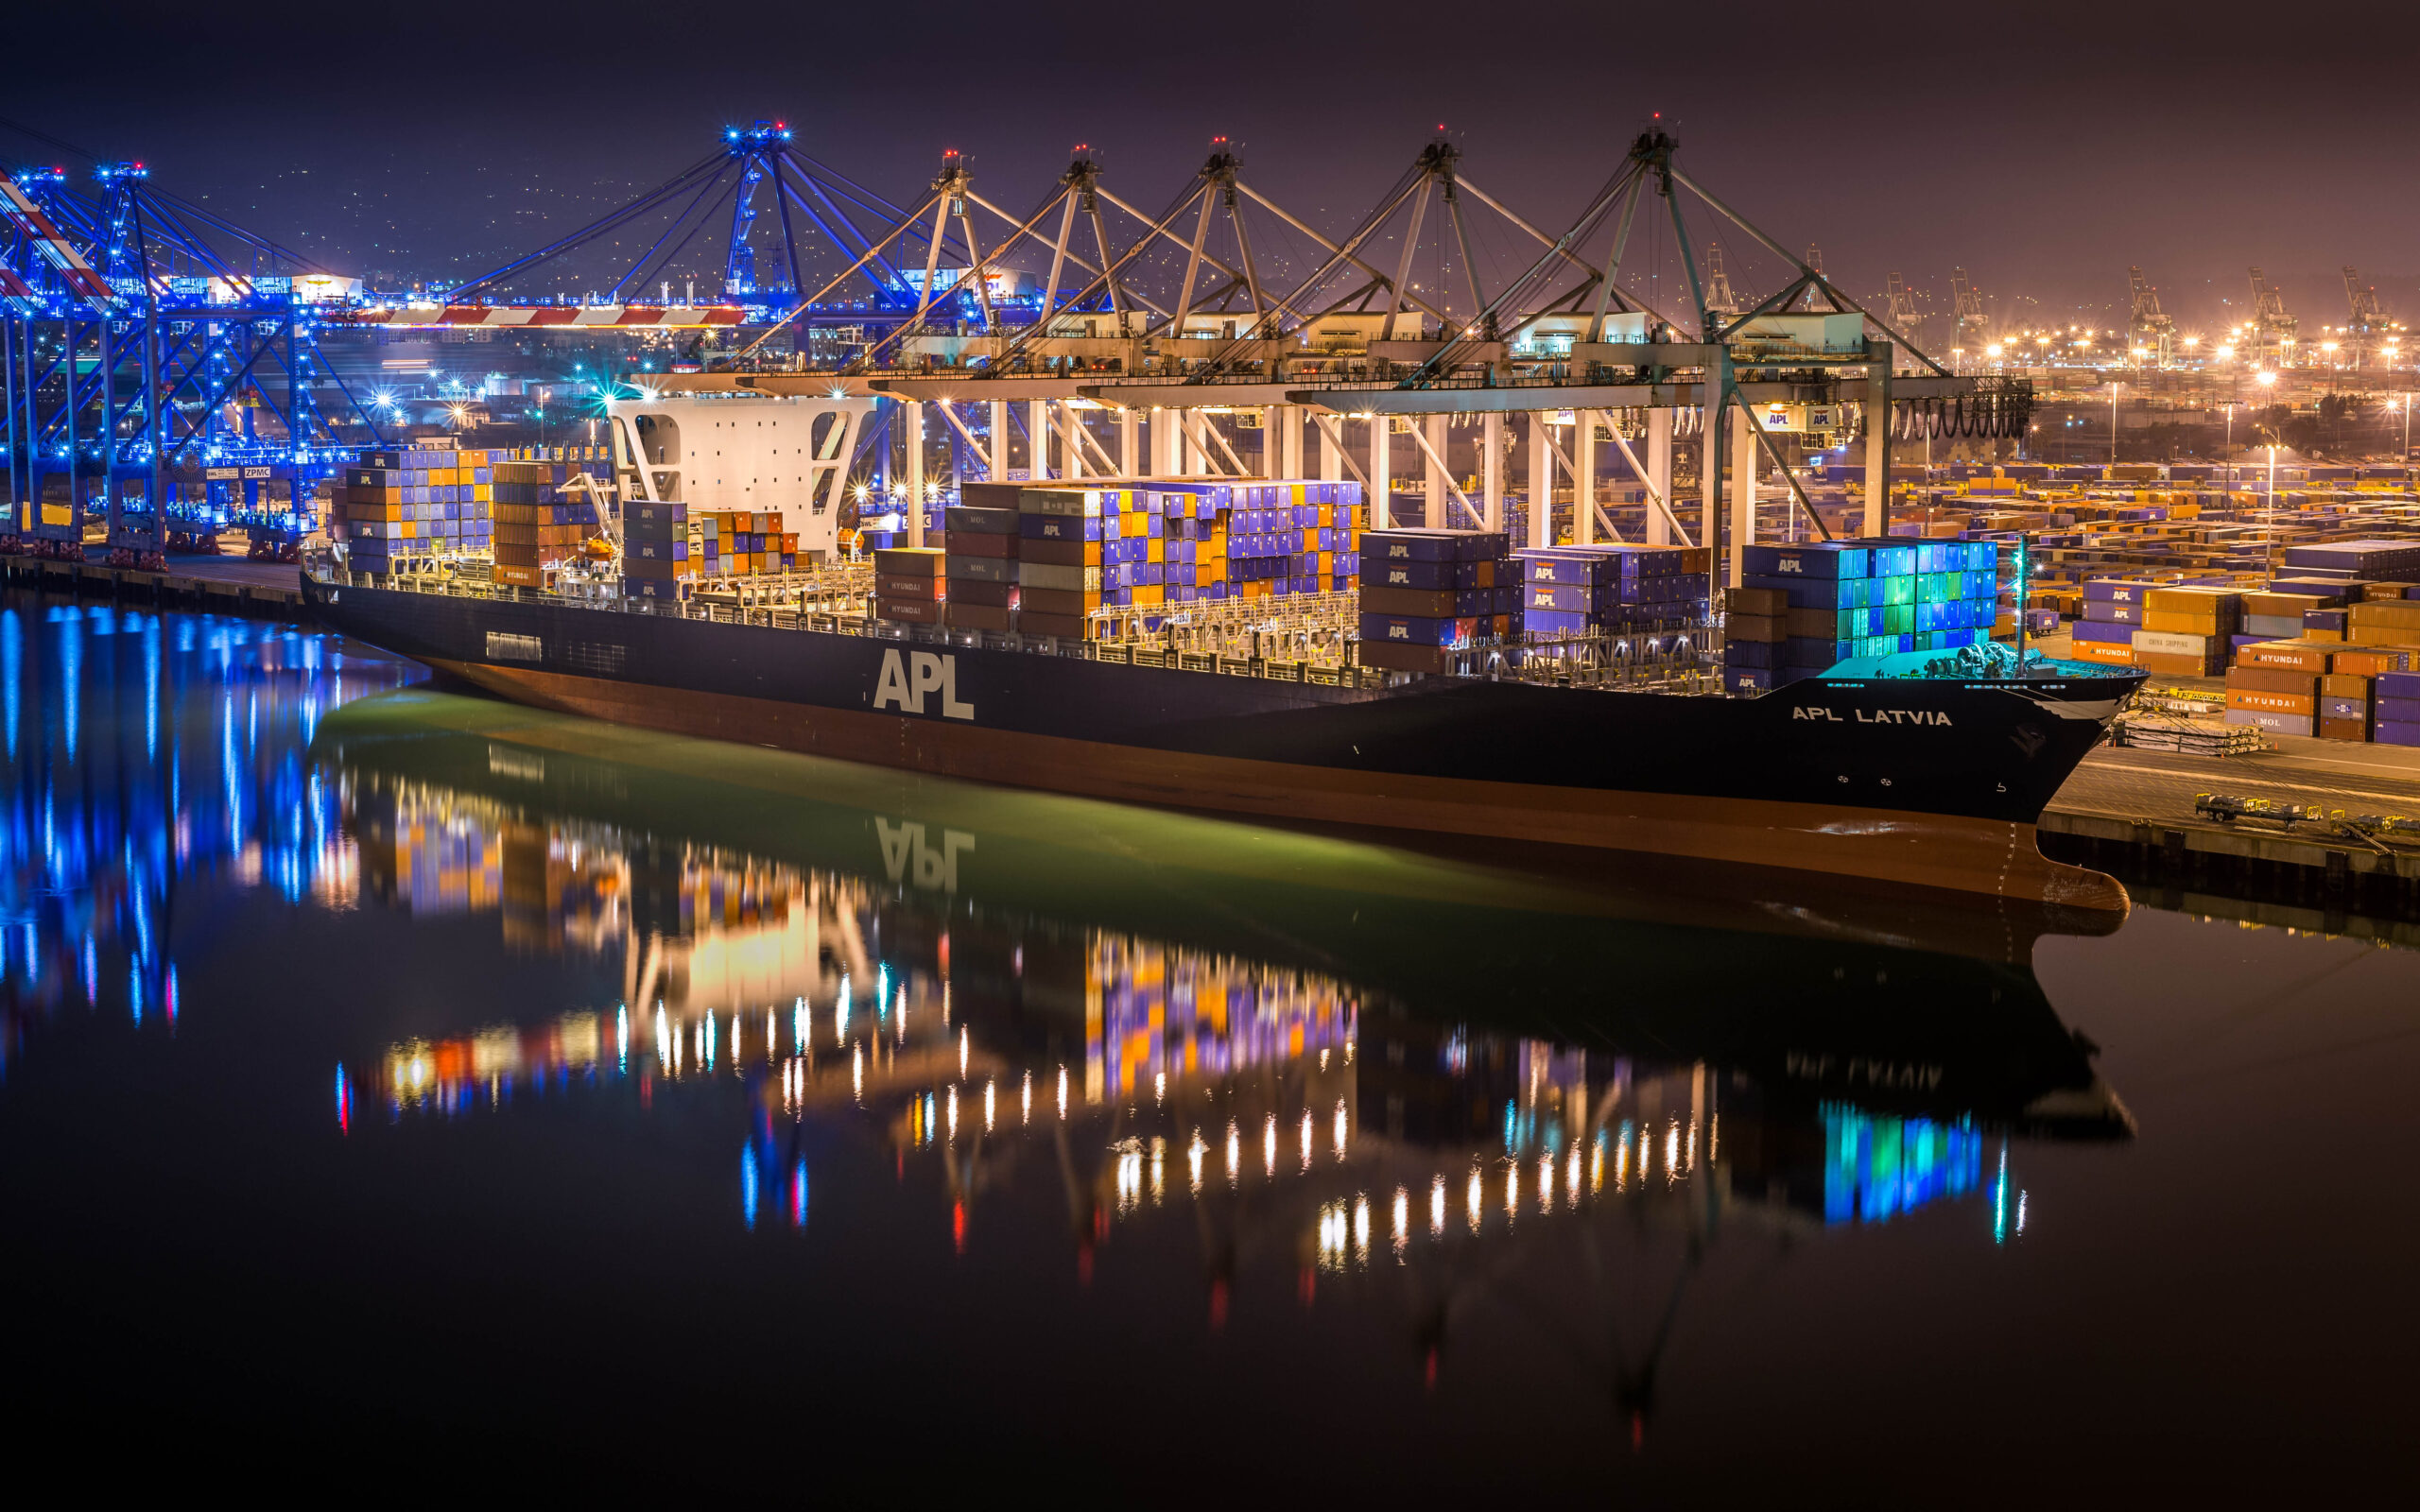 Pier-300-Port-Of-Los-Angeles-California-Lance-Cunningham.jpg